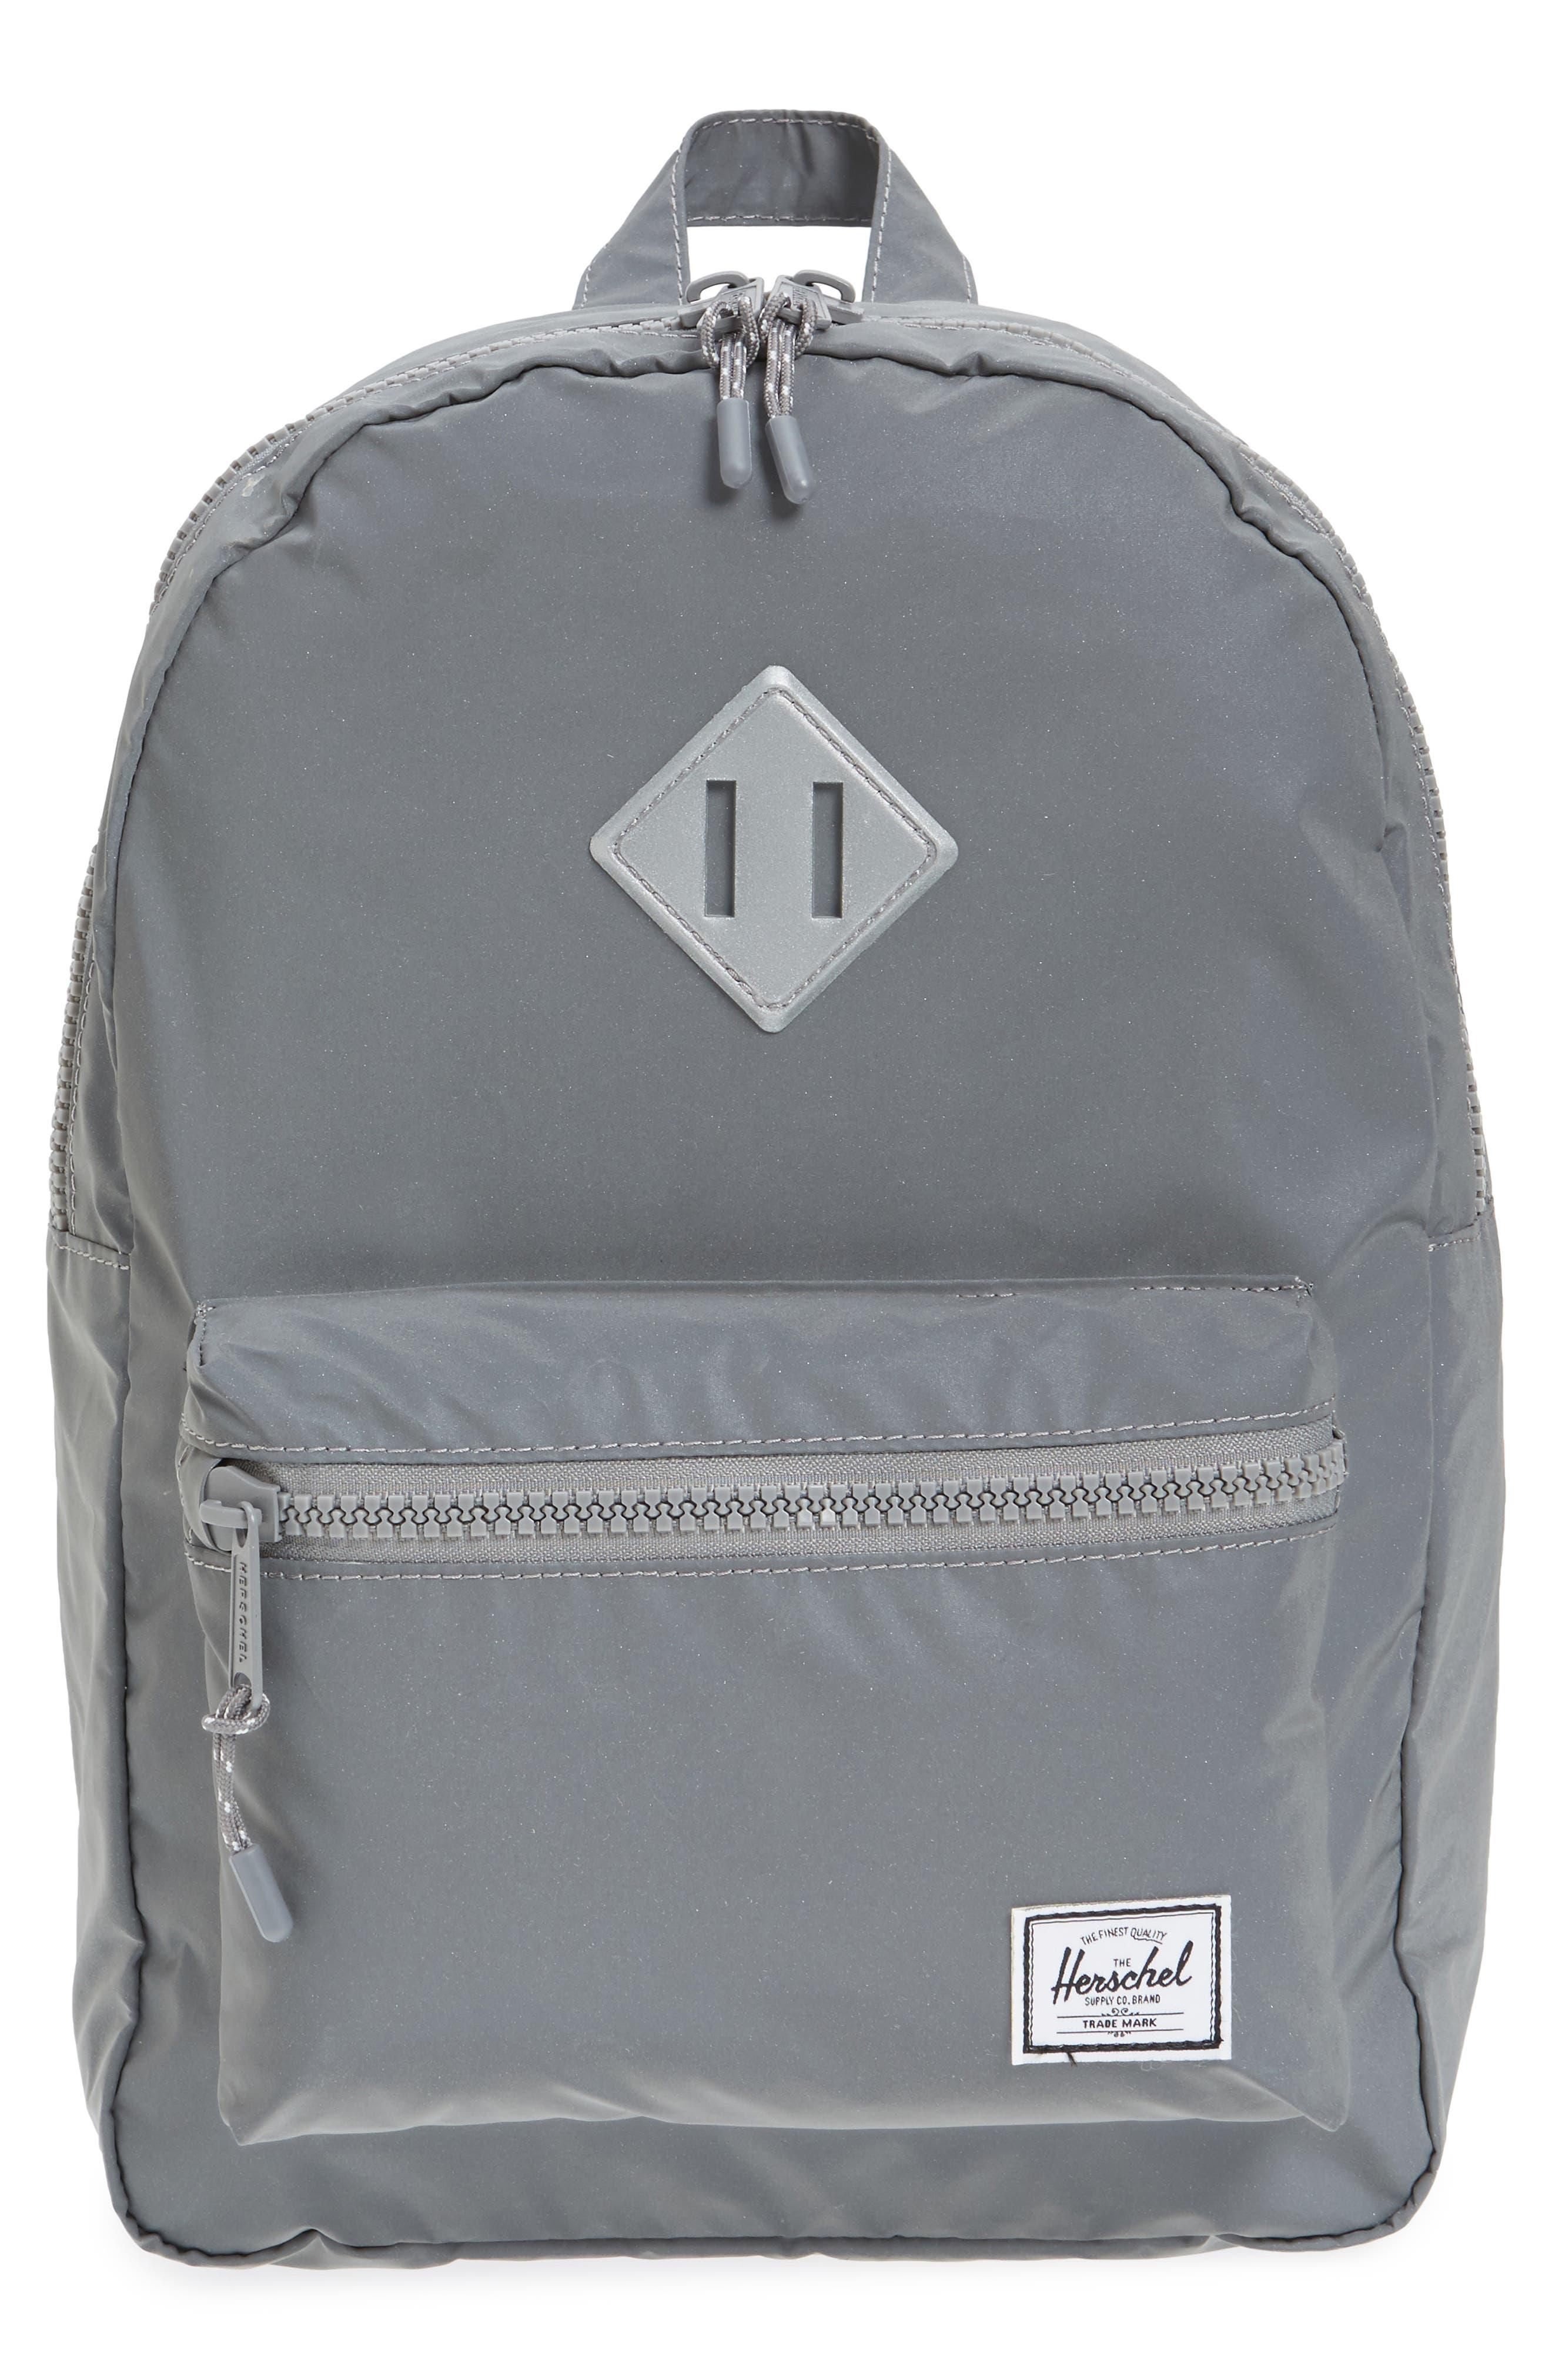 Main Image - Herschel Supply Co. Heritage Reflective Backpack (Kids)